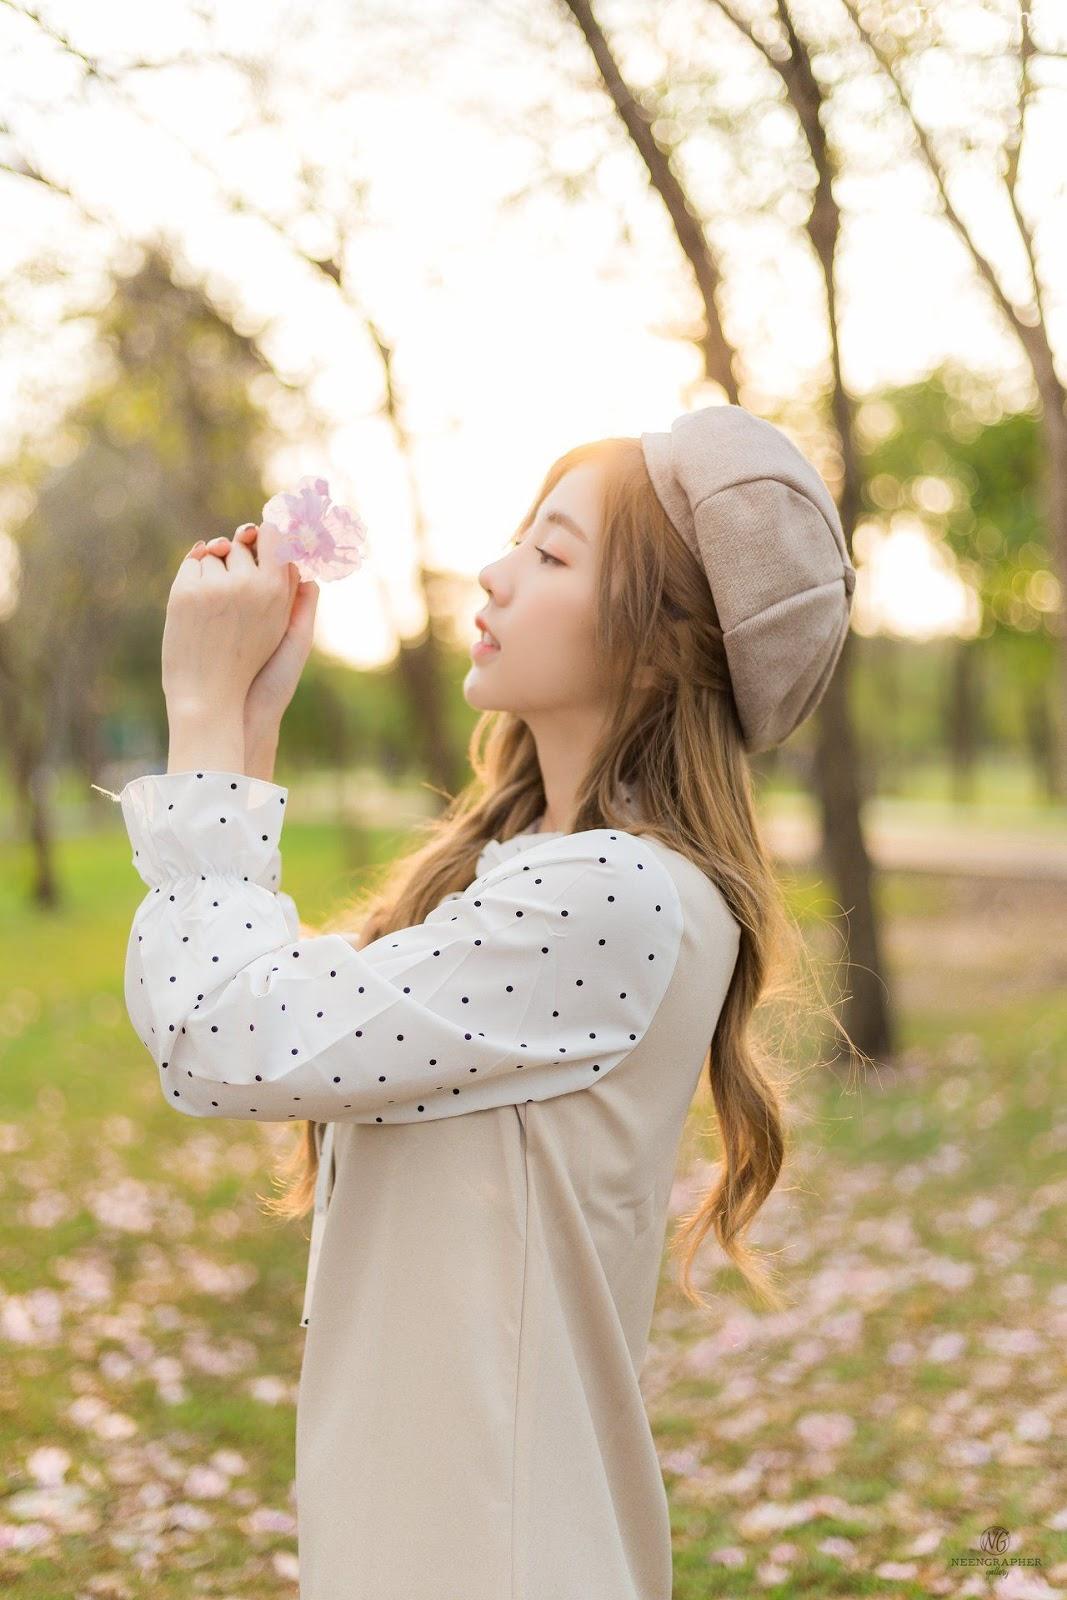 Thailand cute model Nilawan Iamchuasawad - Beautiful girl in the flower field - Photo by จิตรทิวัส จั่นระยับ - Picture 4